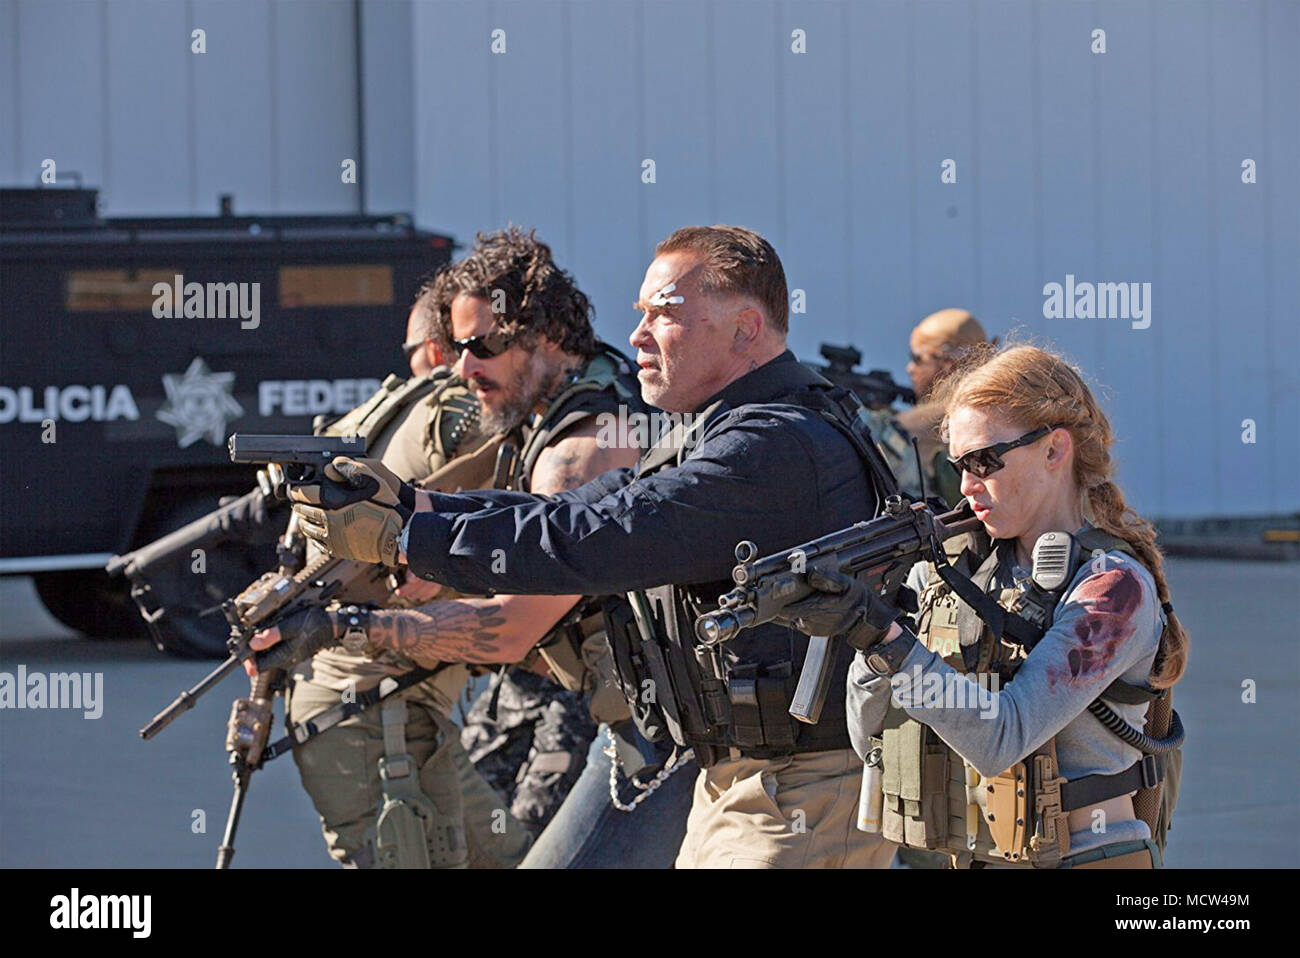 Il sabotaggio 2014 Open Road Films Production con Arnold Schwarzenegger e Mireille Enos a destra Immagini Stock